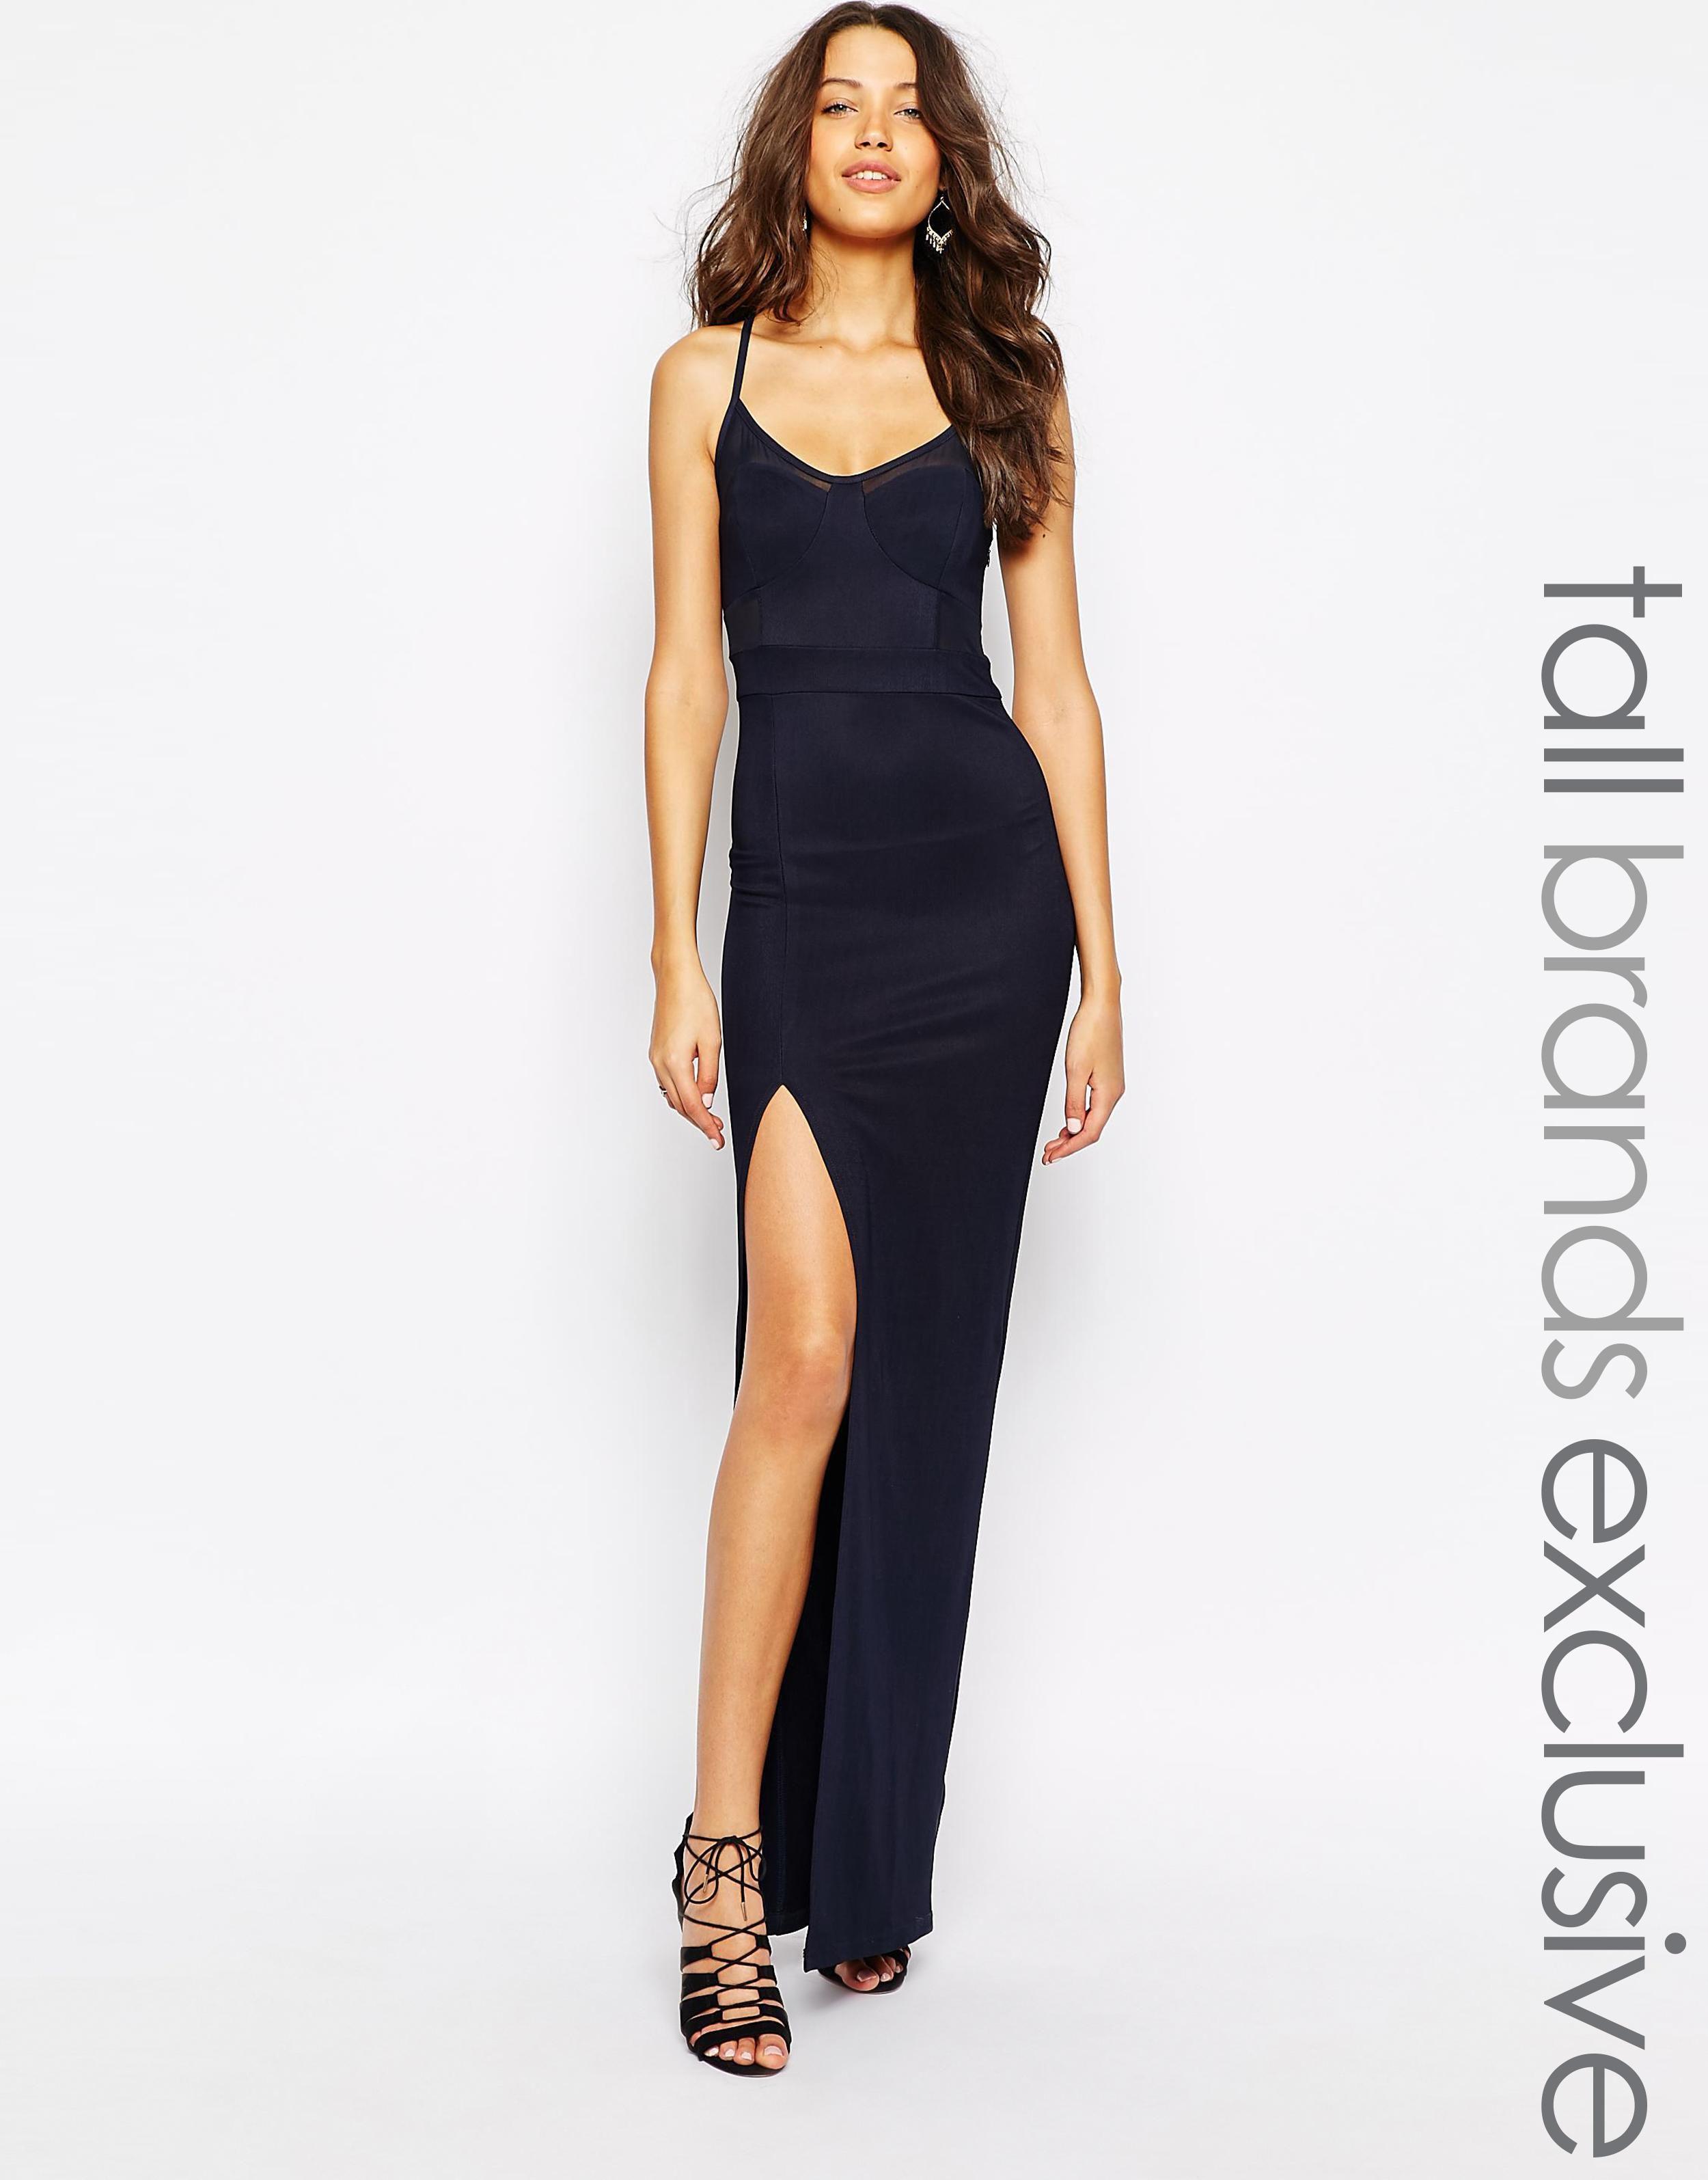 Us Asos Com True Decadence Tall Mesh Insert Maxi Dress With Thigh Split Candice Blackburn 5013526 Produ Split Maxi Dress Dresses Maxi Dress [ 3190 x 2500 Pixel ]